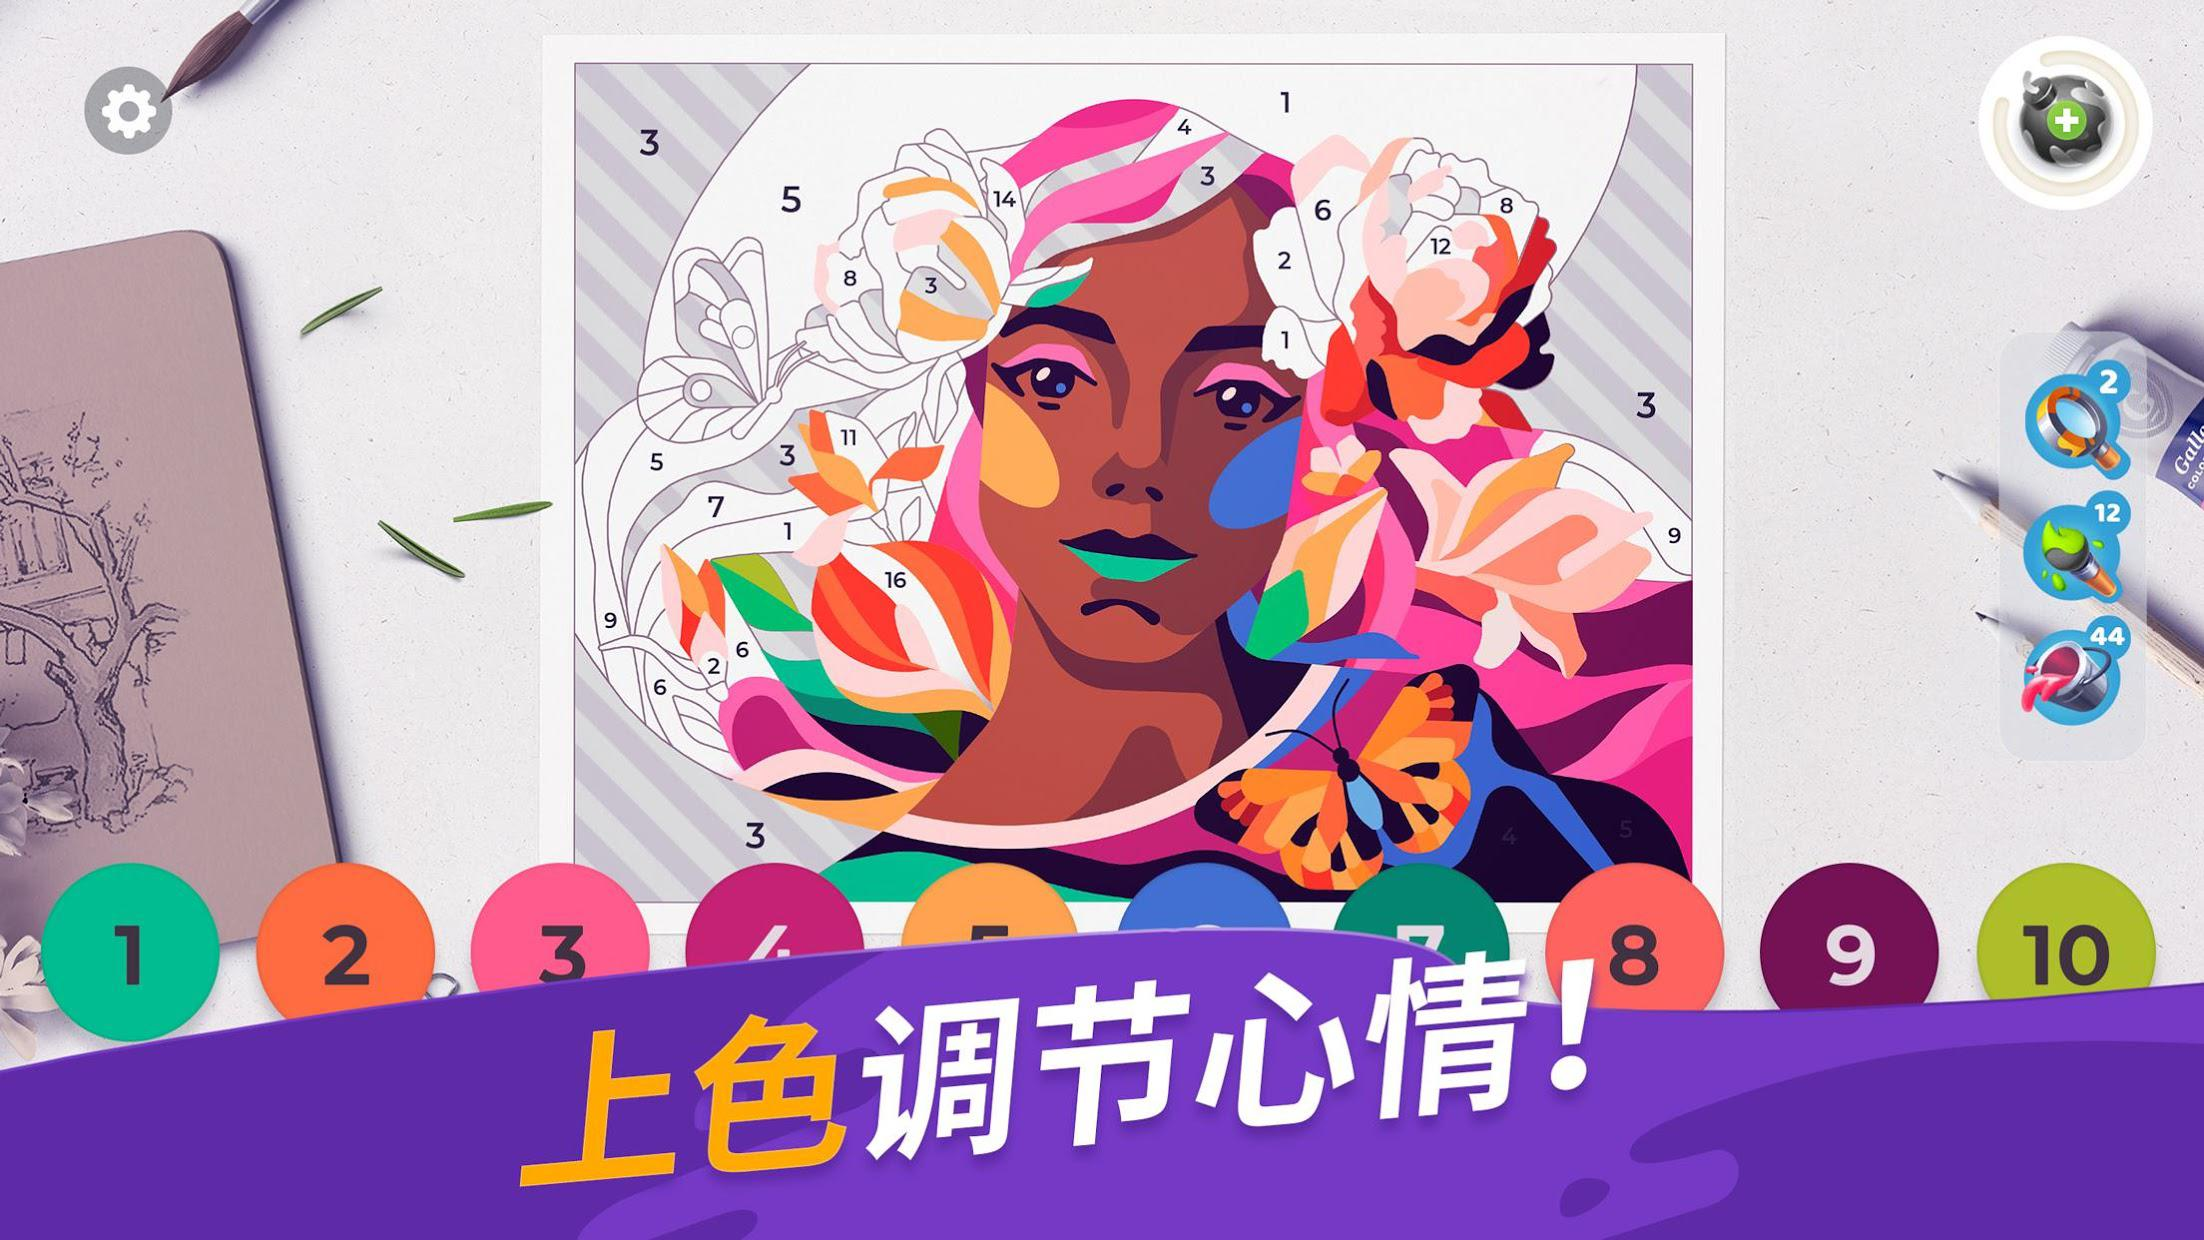 Gallery:涂色本和装饰 游戏截图1